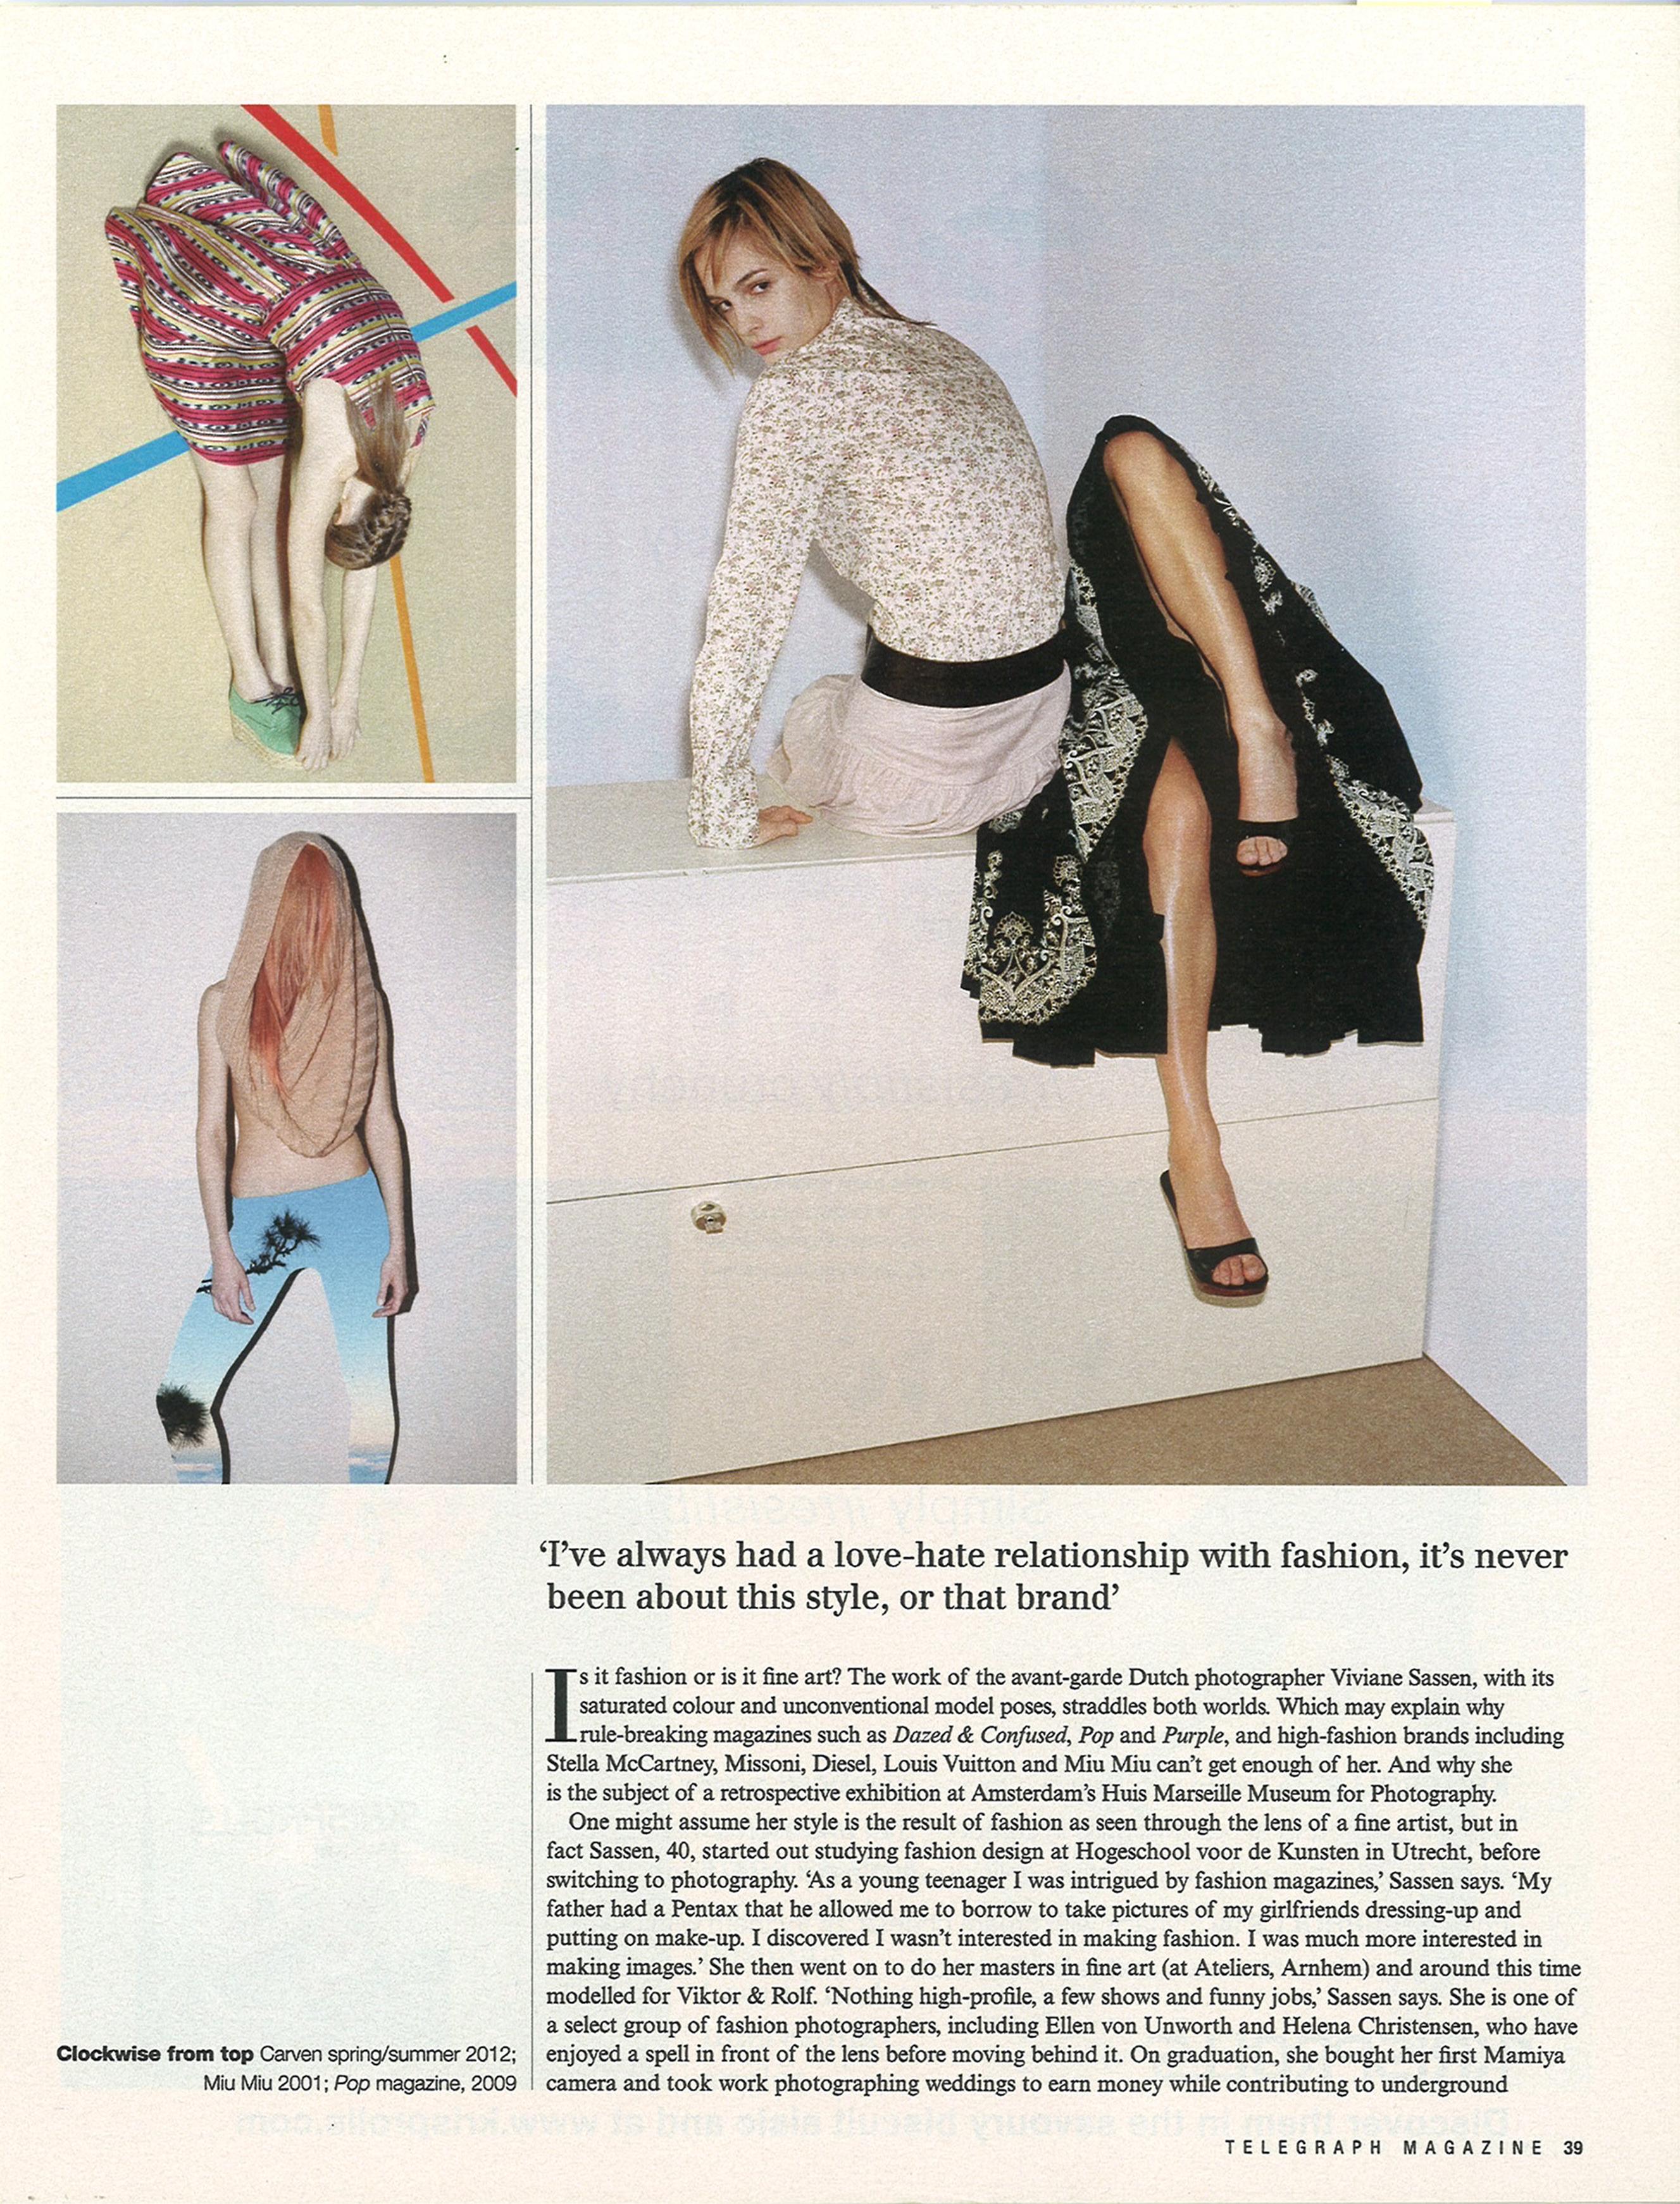 Julia-Robson-Viviane-Sassen-photographer-Telegraph-magazine-March-2013-3(of4)